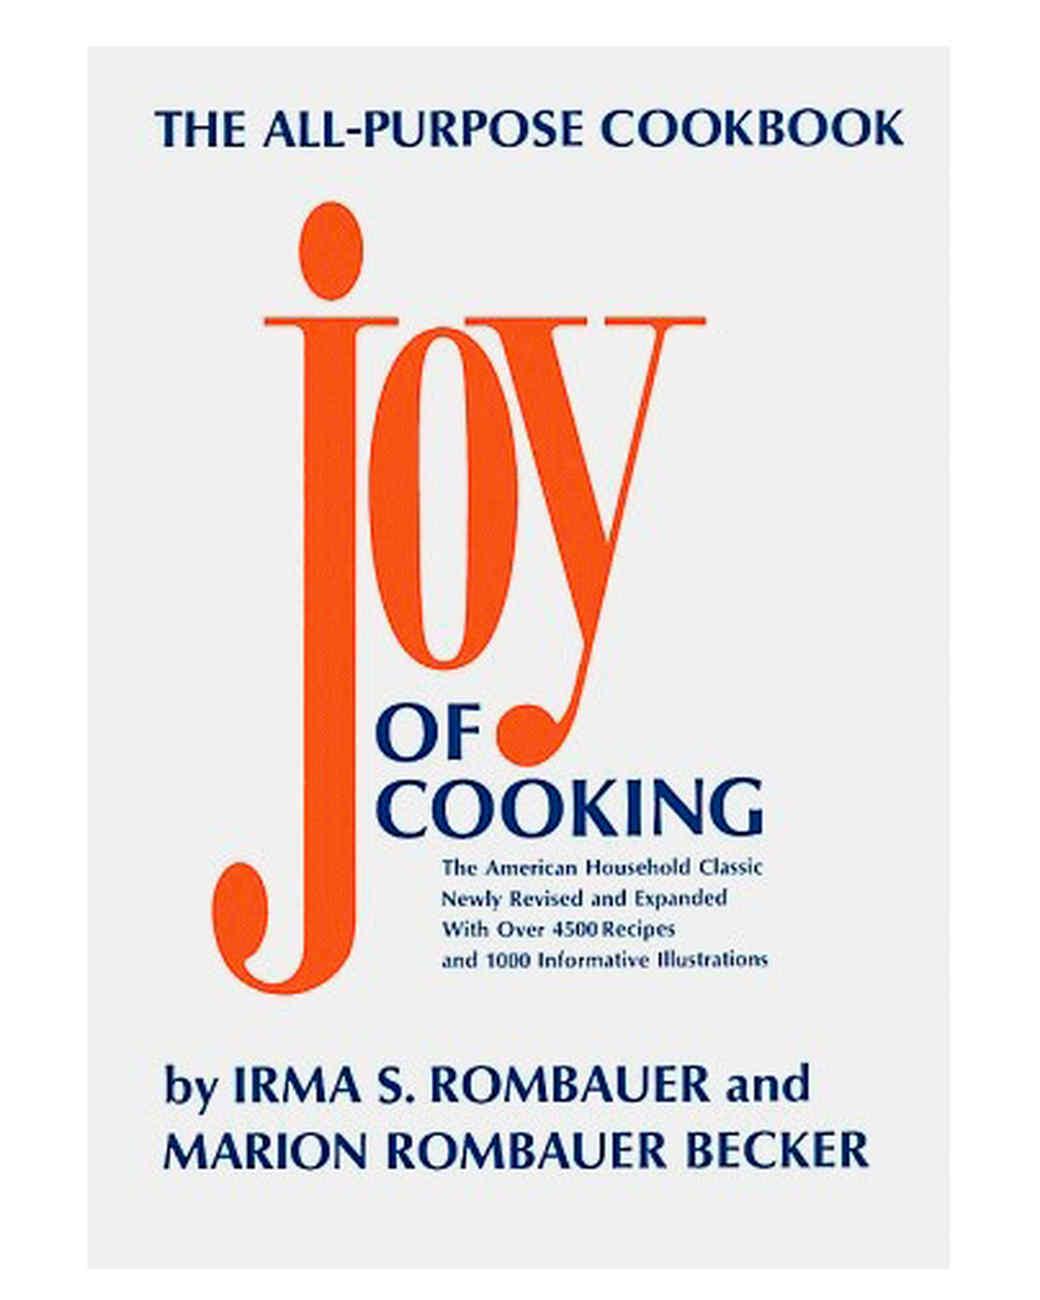 mscookbook-content-joy-0922.jpg